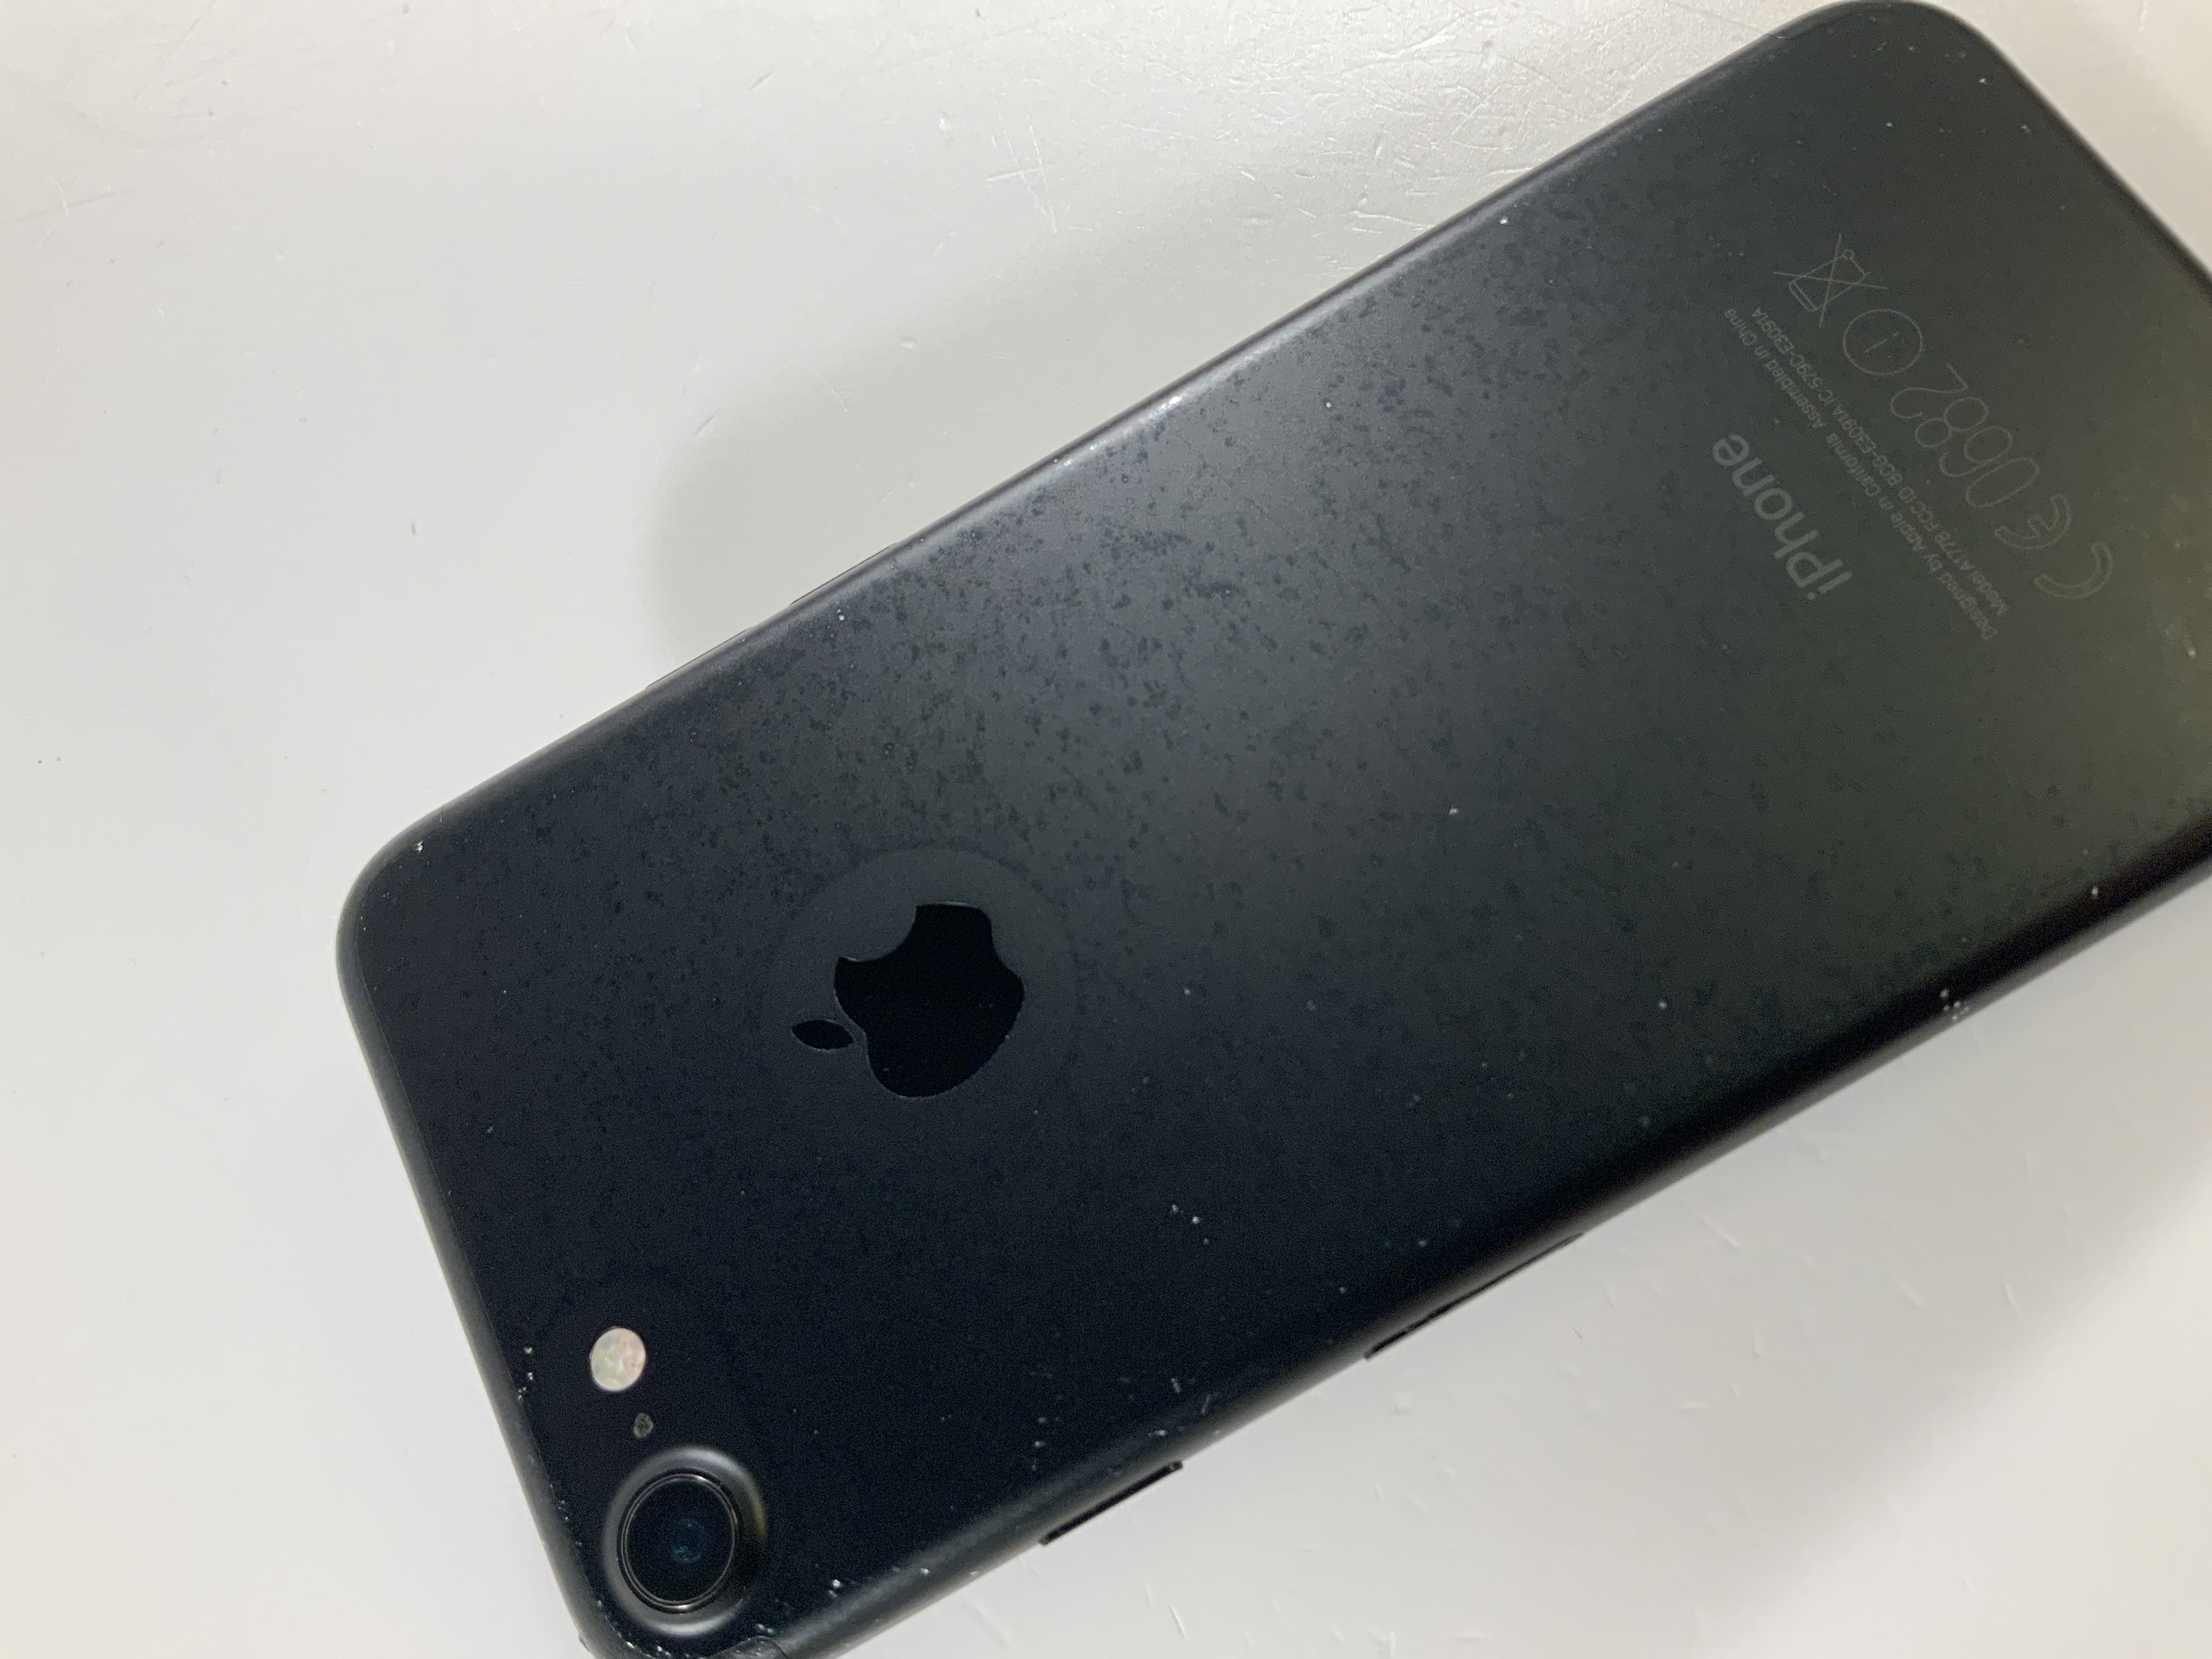 iPhone 7 128GB, 128GB, Black, Afbeelding 3